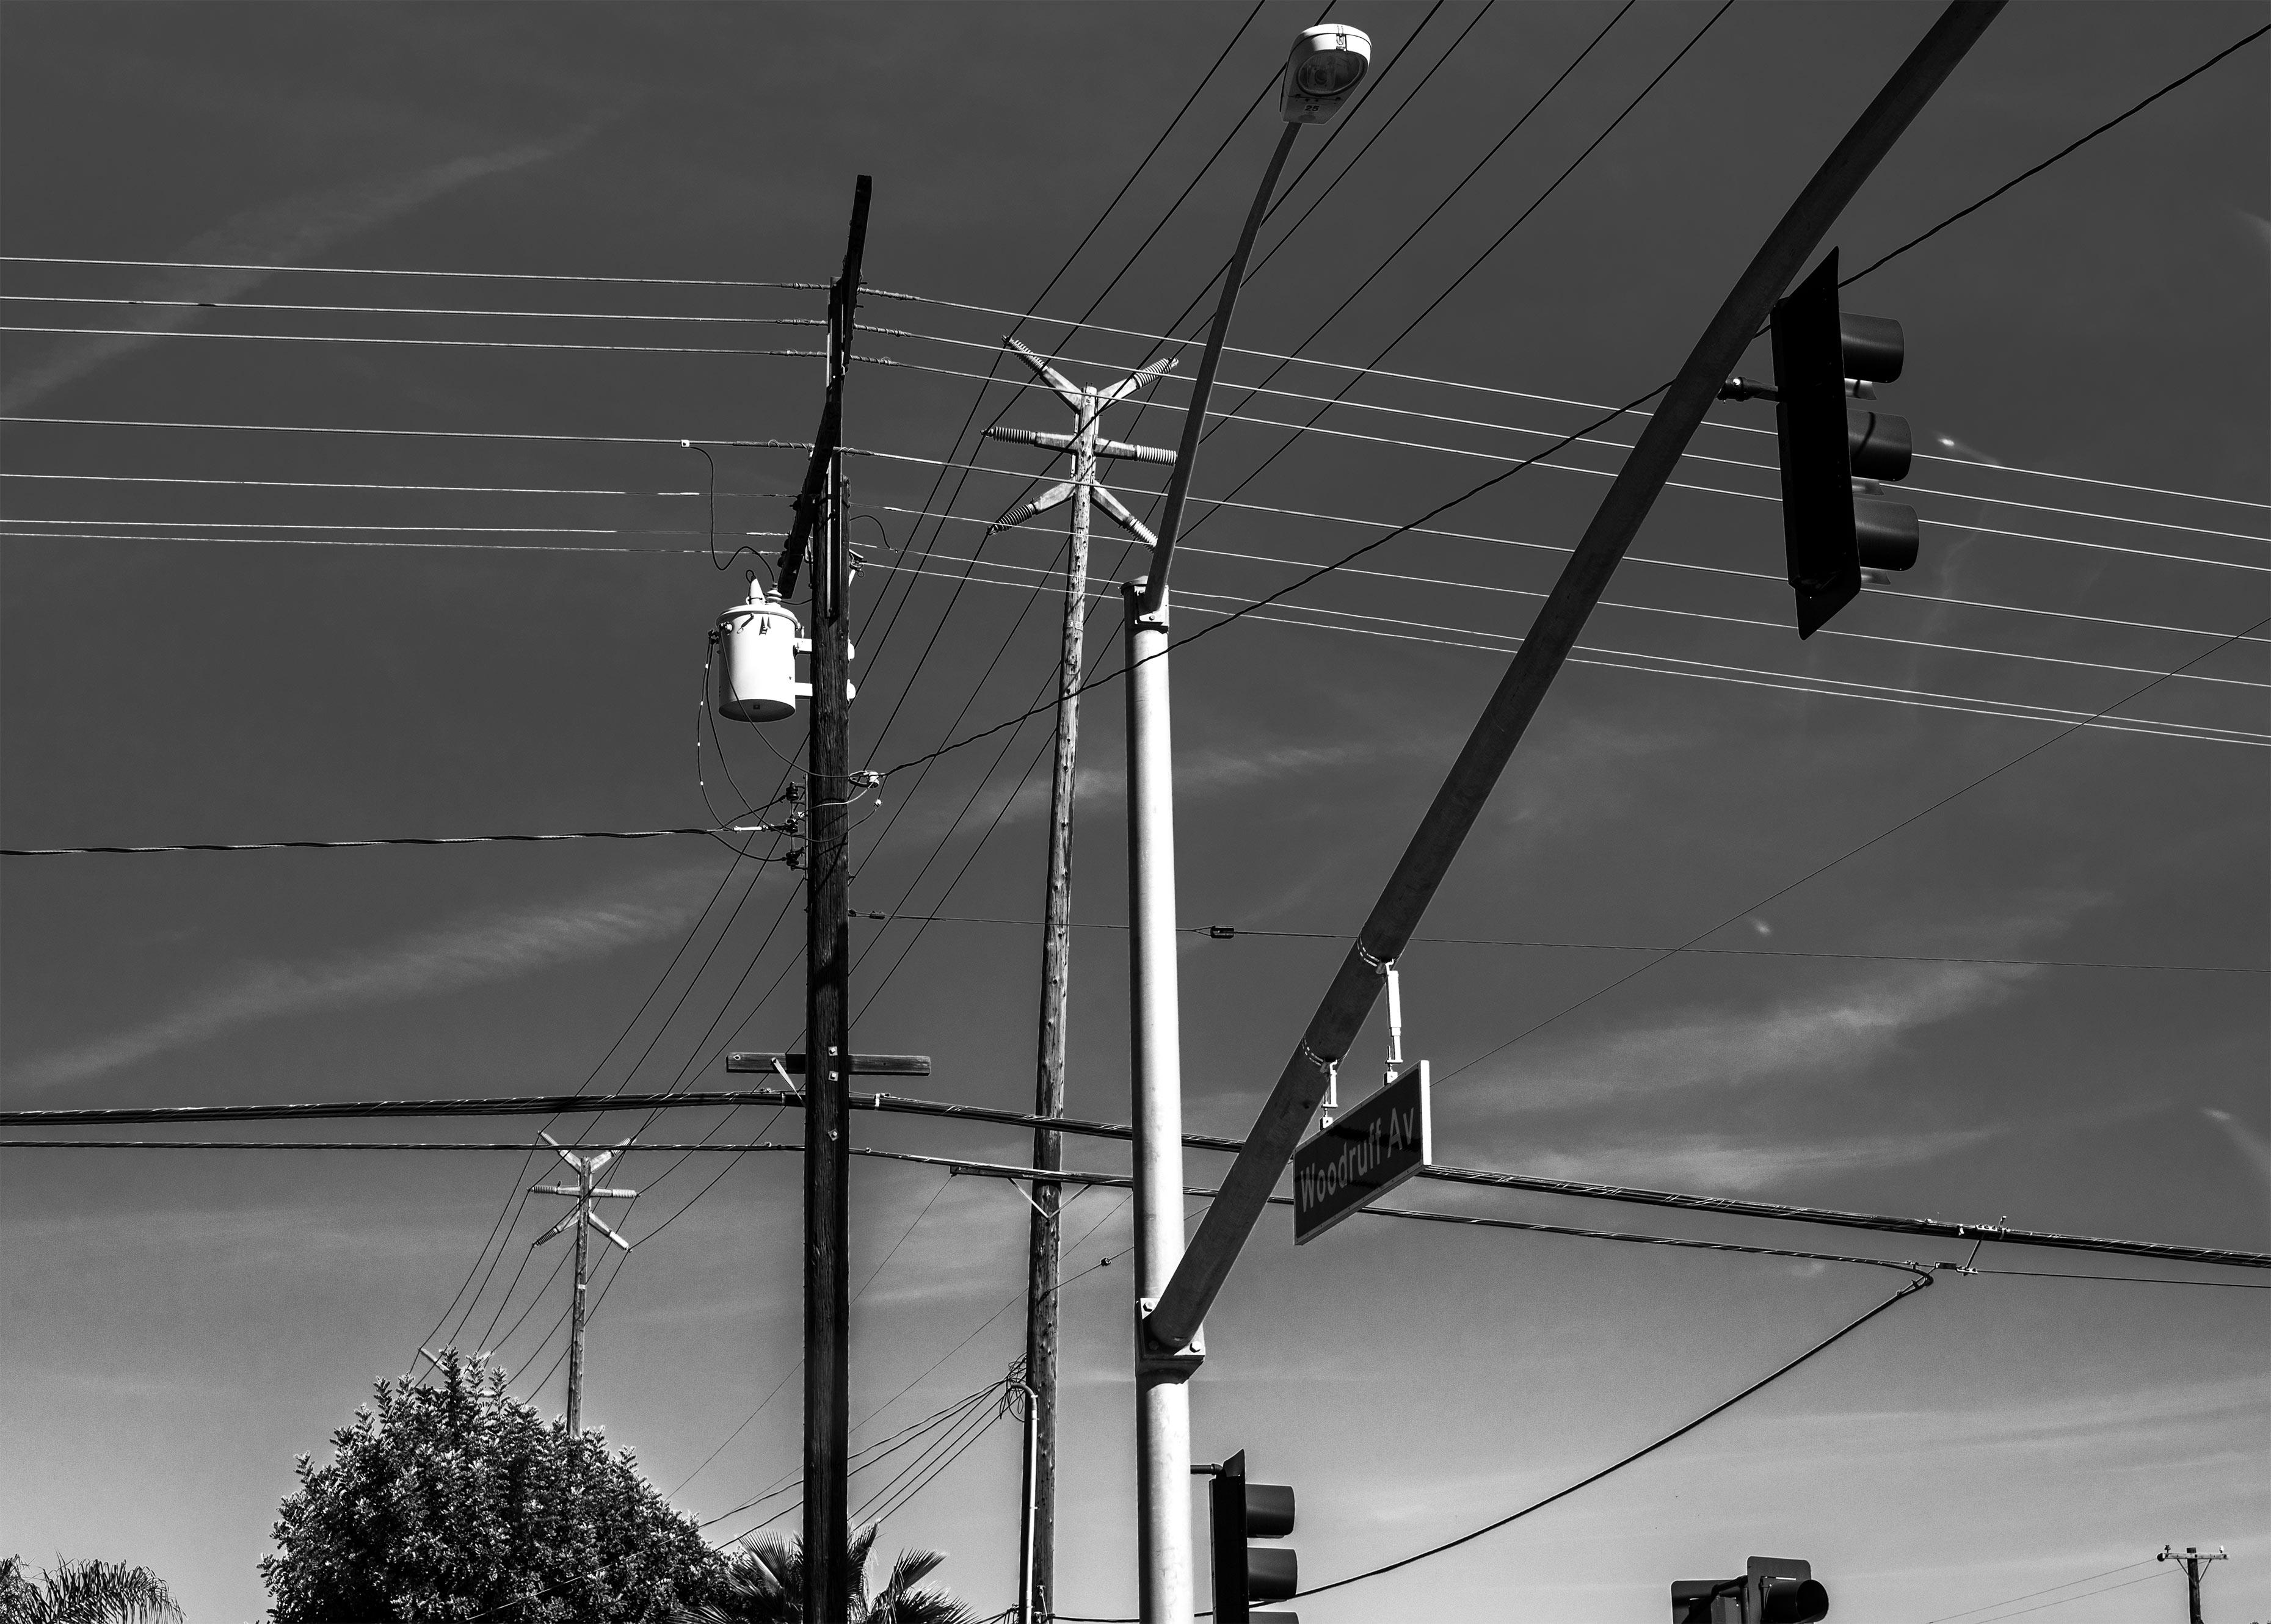 Wallpaper : trees, lights, street light, sky, wind, telephone, wires ...